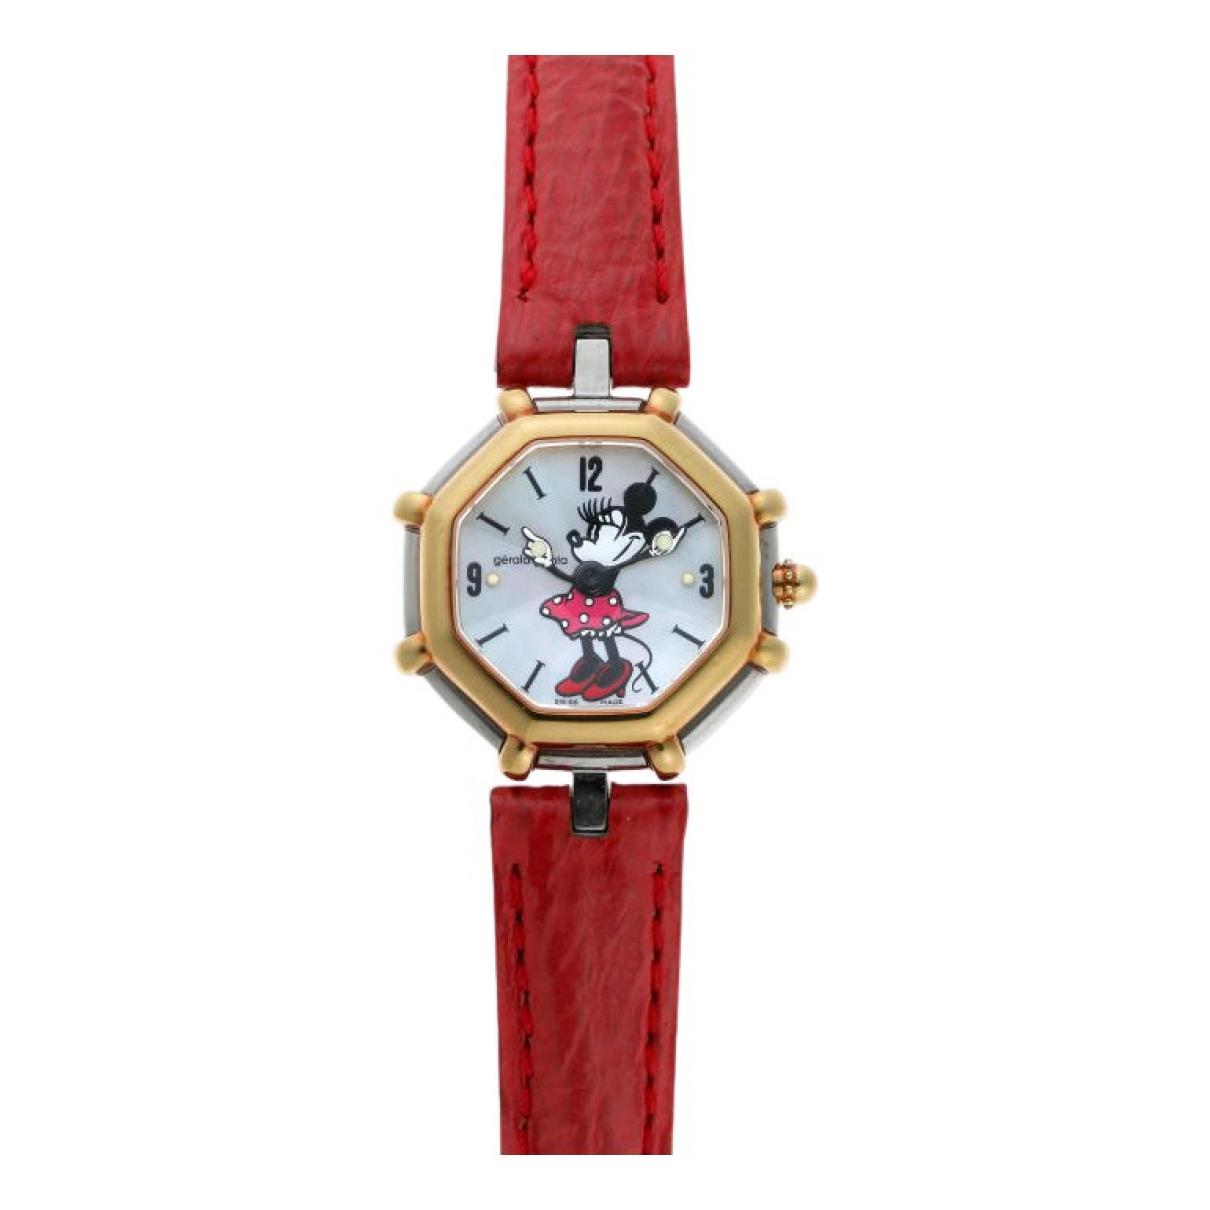 Reloj Gerald Genta